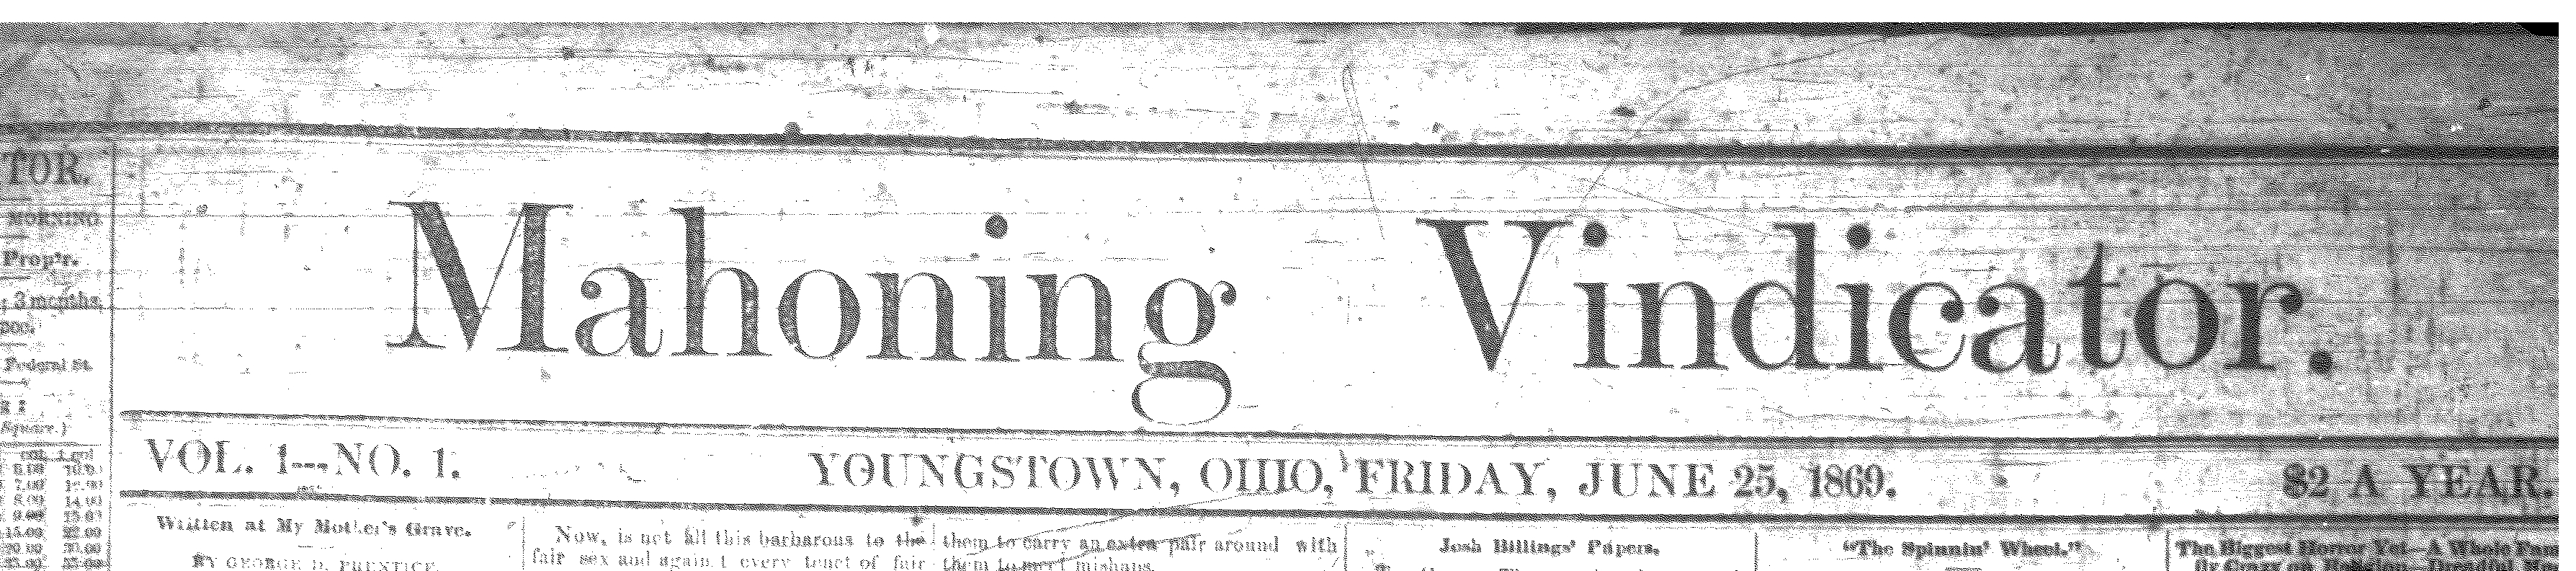 first vindicator issue 1869